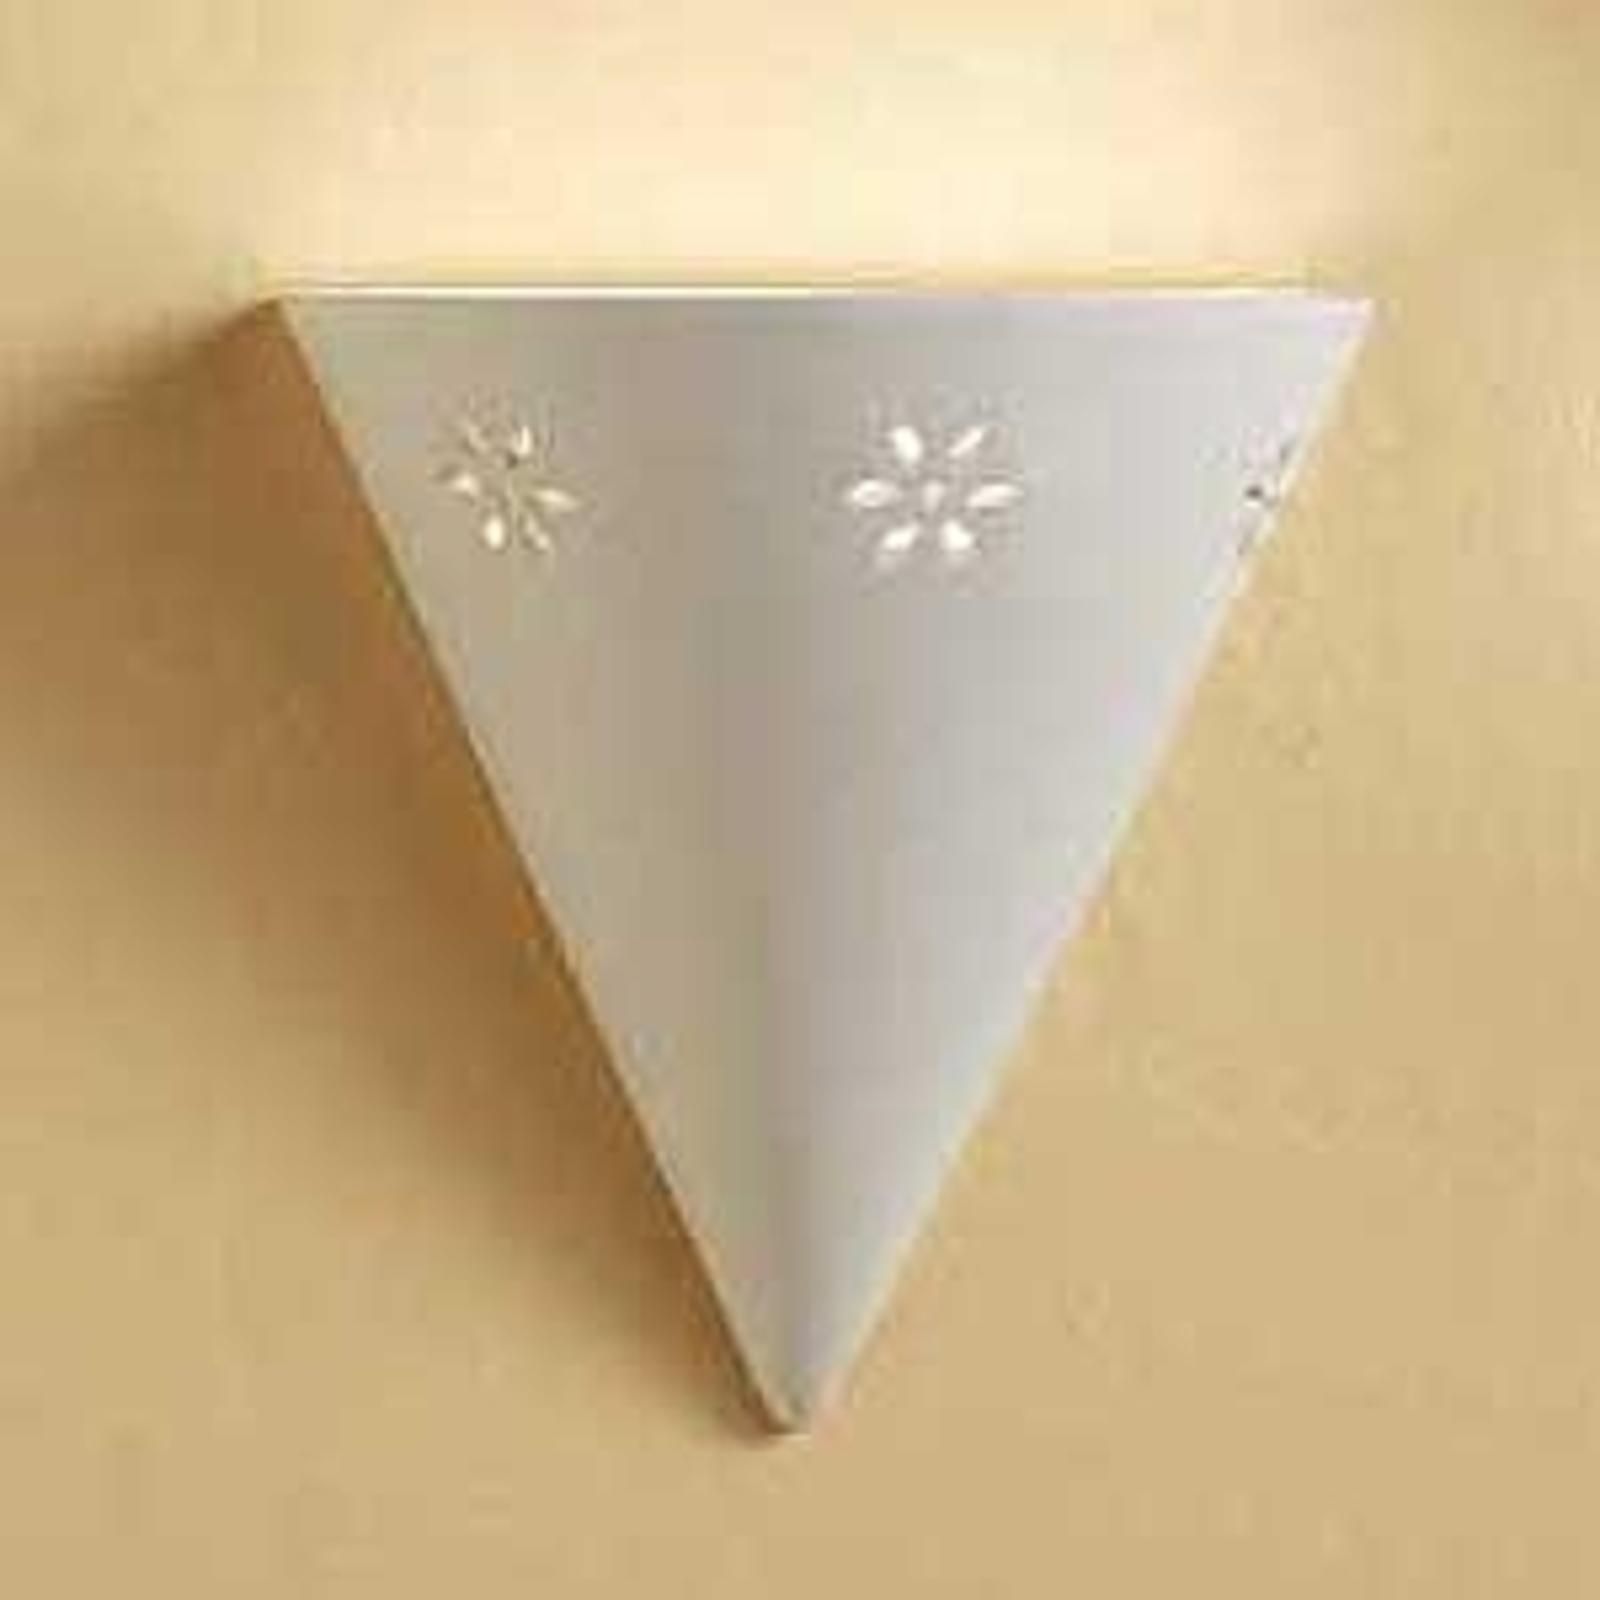 Statige wandlamp CONO van wit keramiek